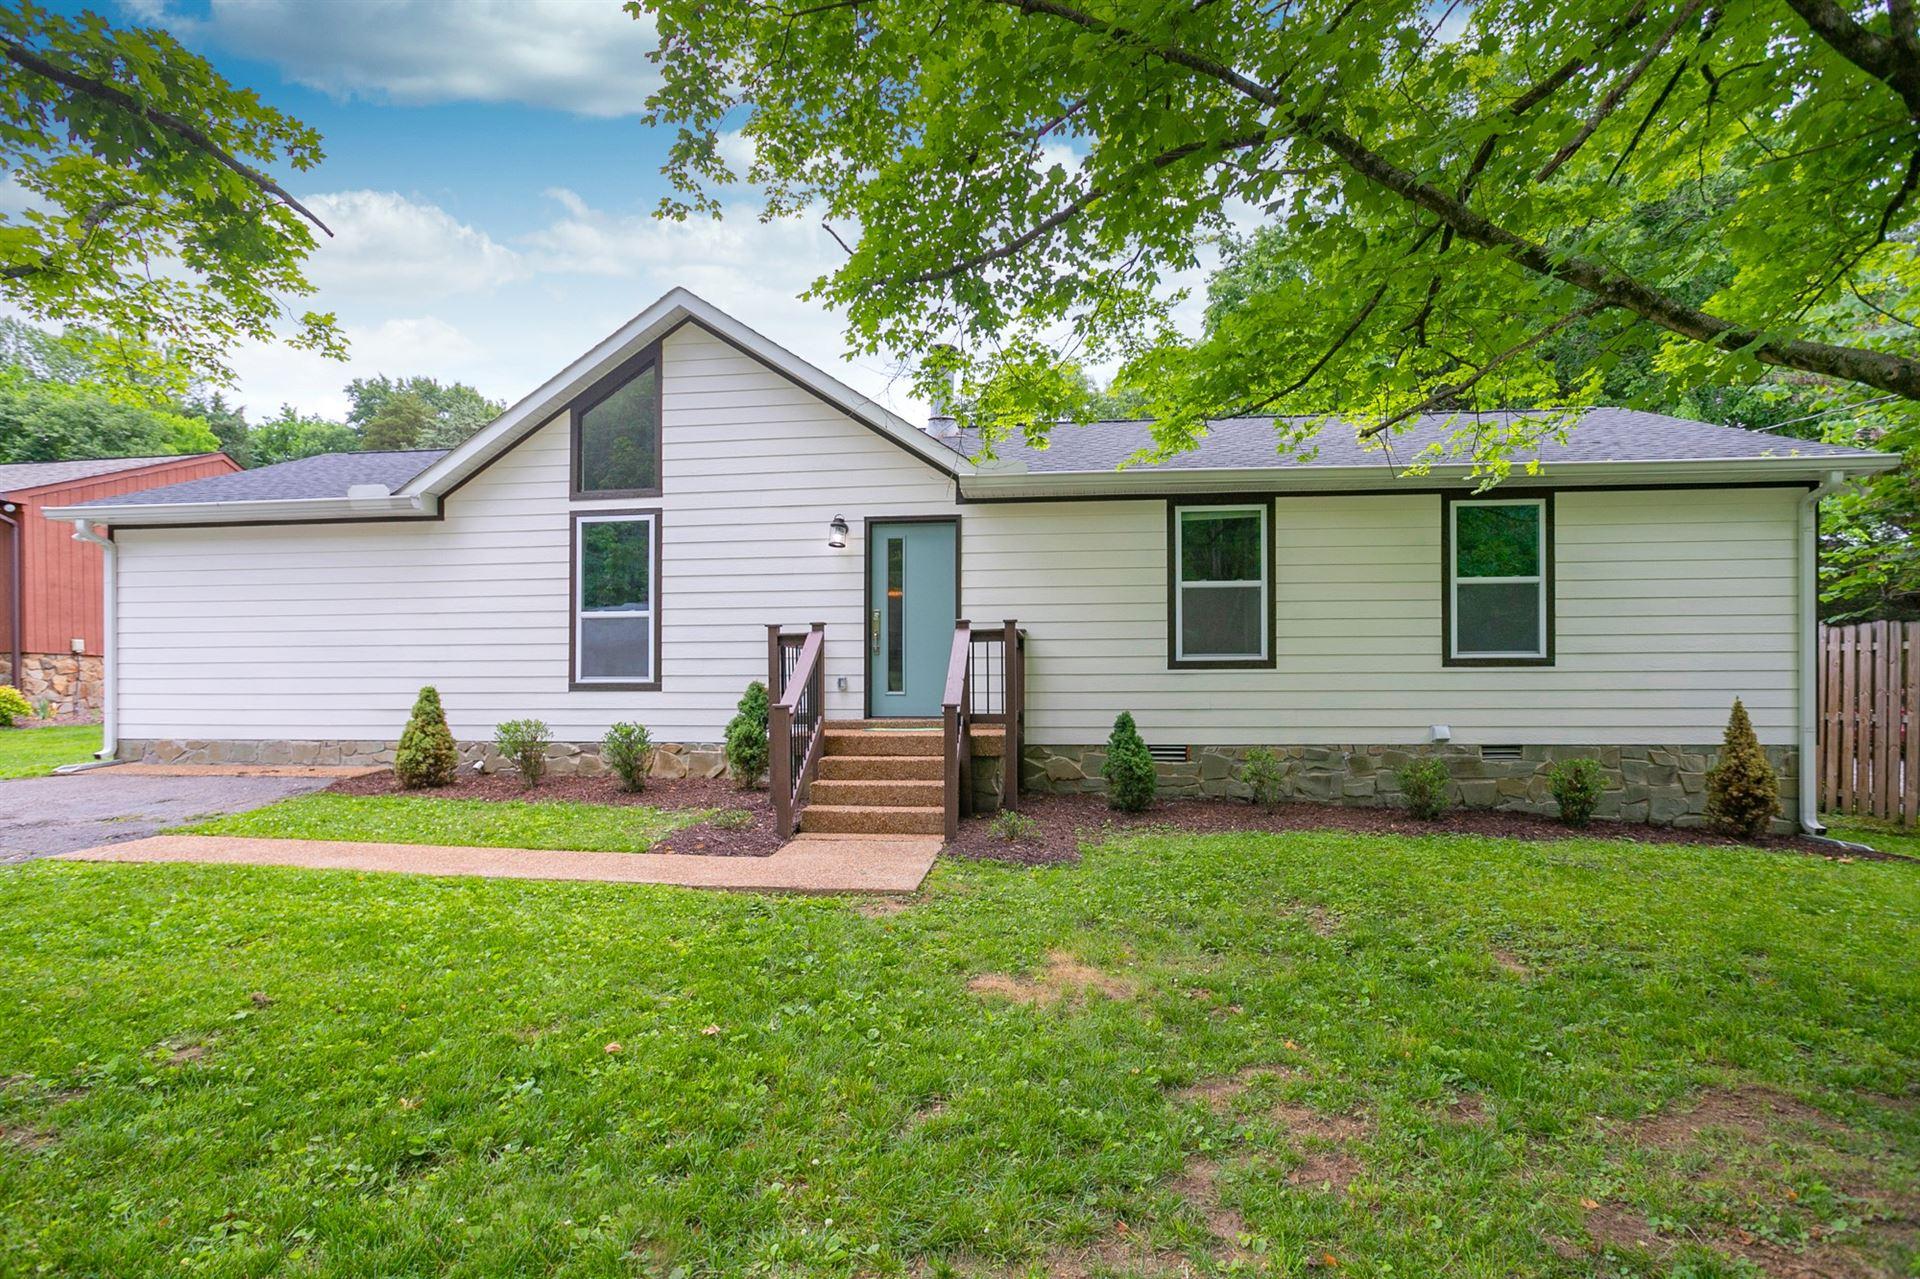 Photo of 657 Mercer Dr, Hermitage, TN 37076 (MLS # 2261022)